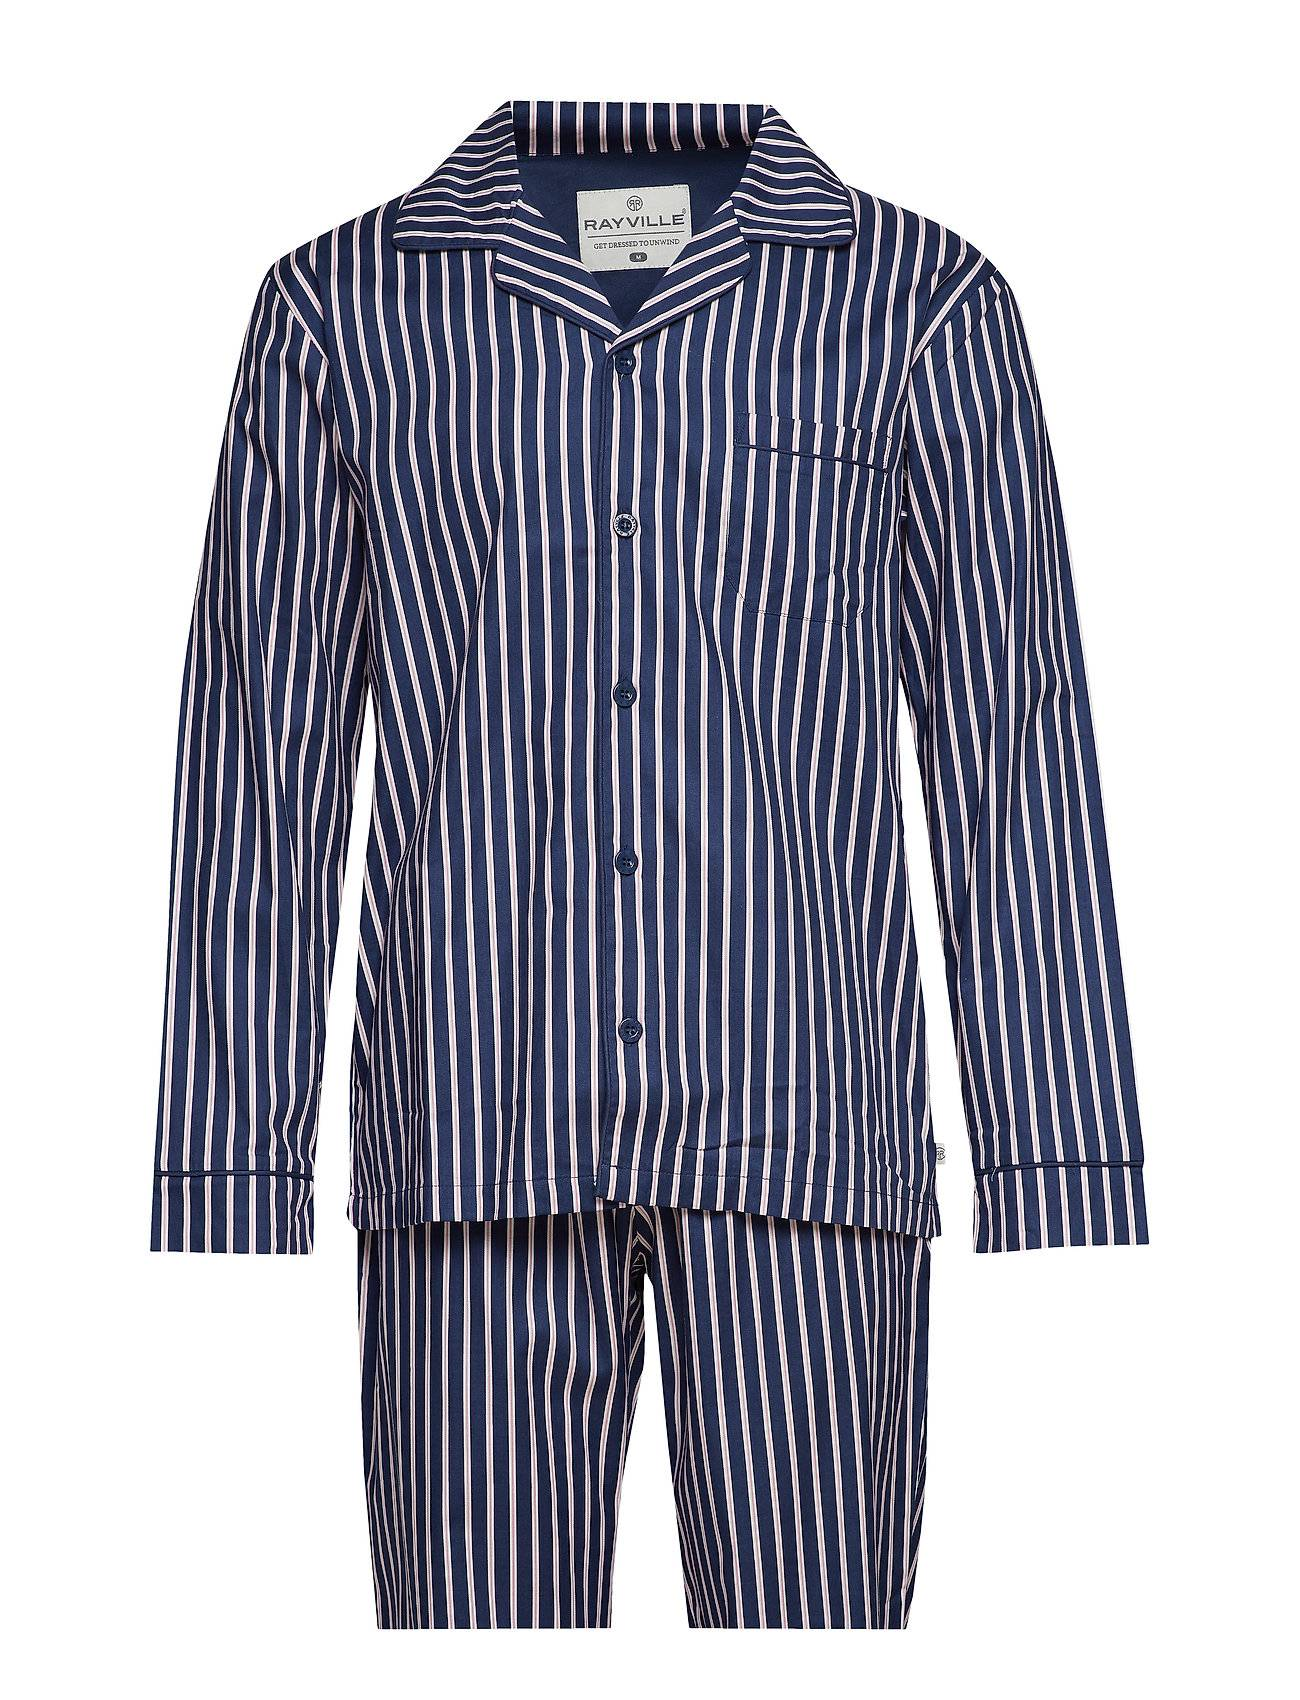 Rayville Mick Pyjamas Pencil Stripe - Blue/Pink - S